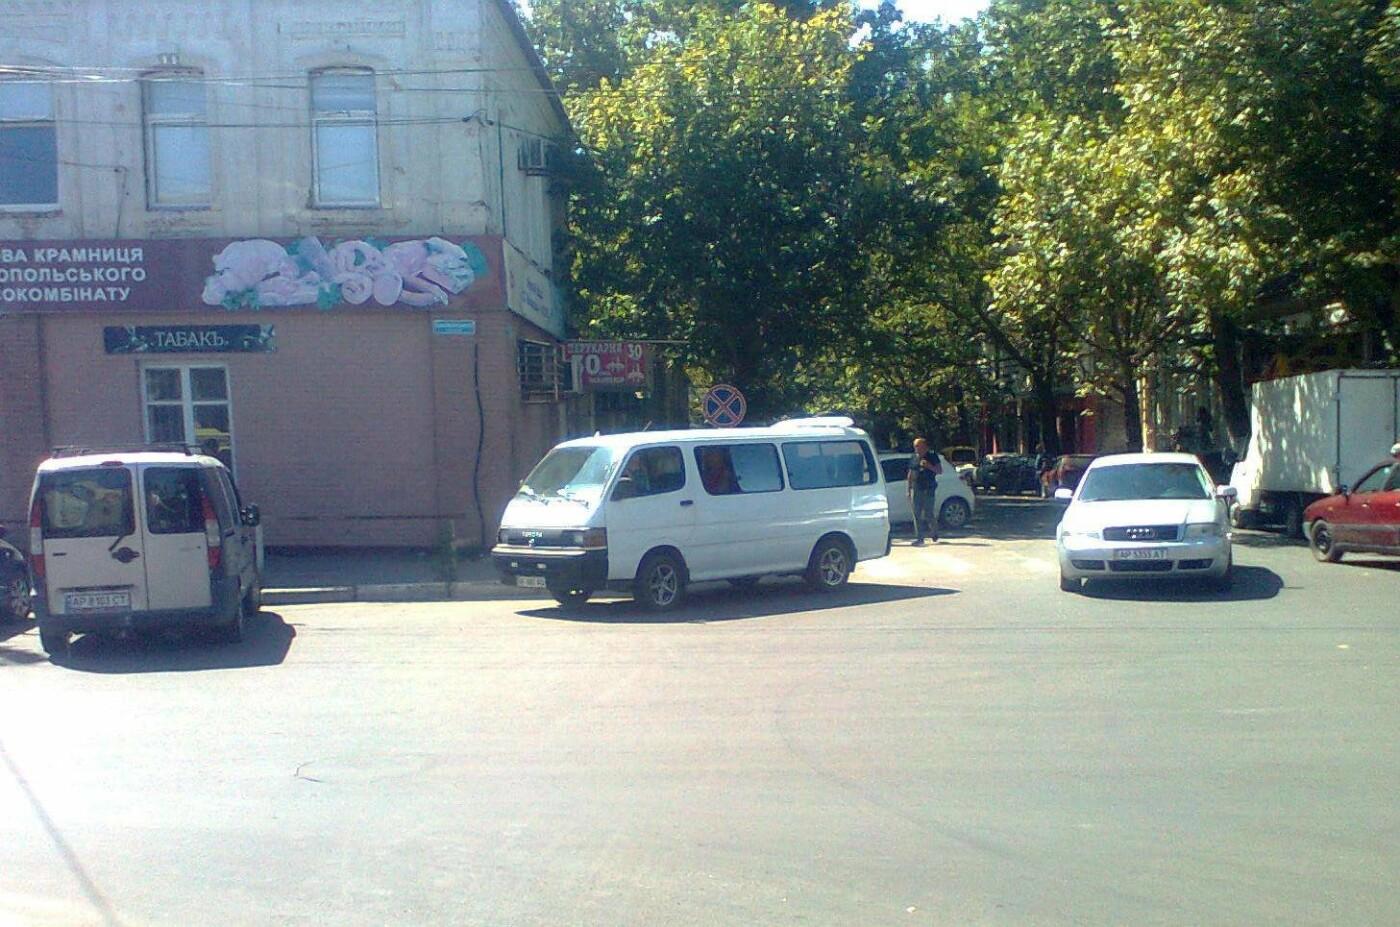 В нижней части Мелитополя заметили очередного автохама, фото-2, Фото из соцсетей